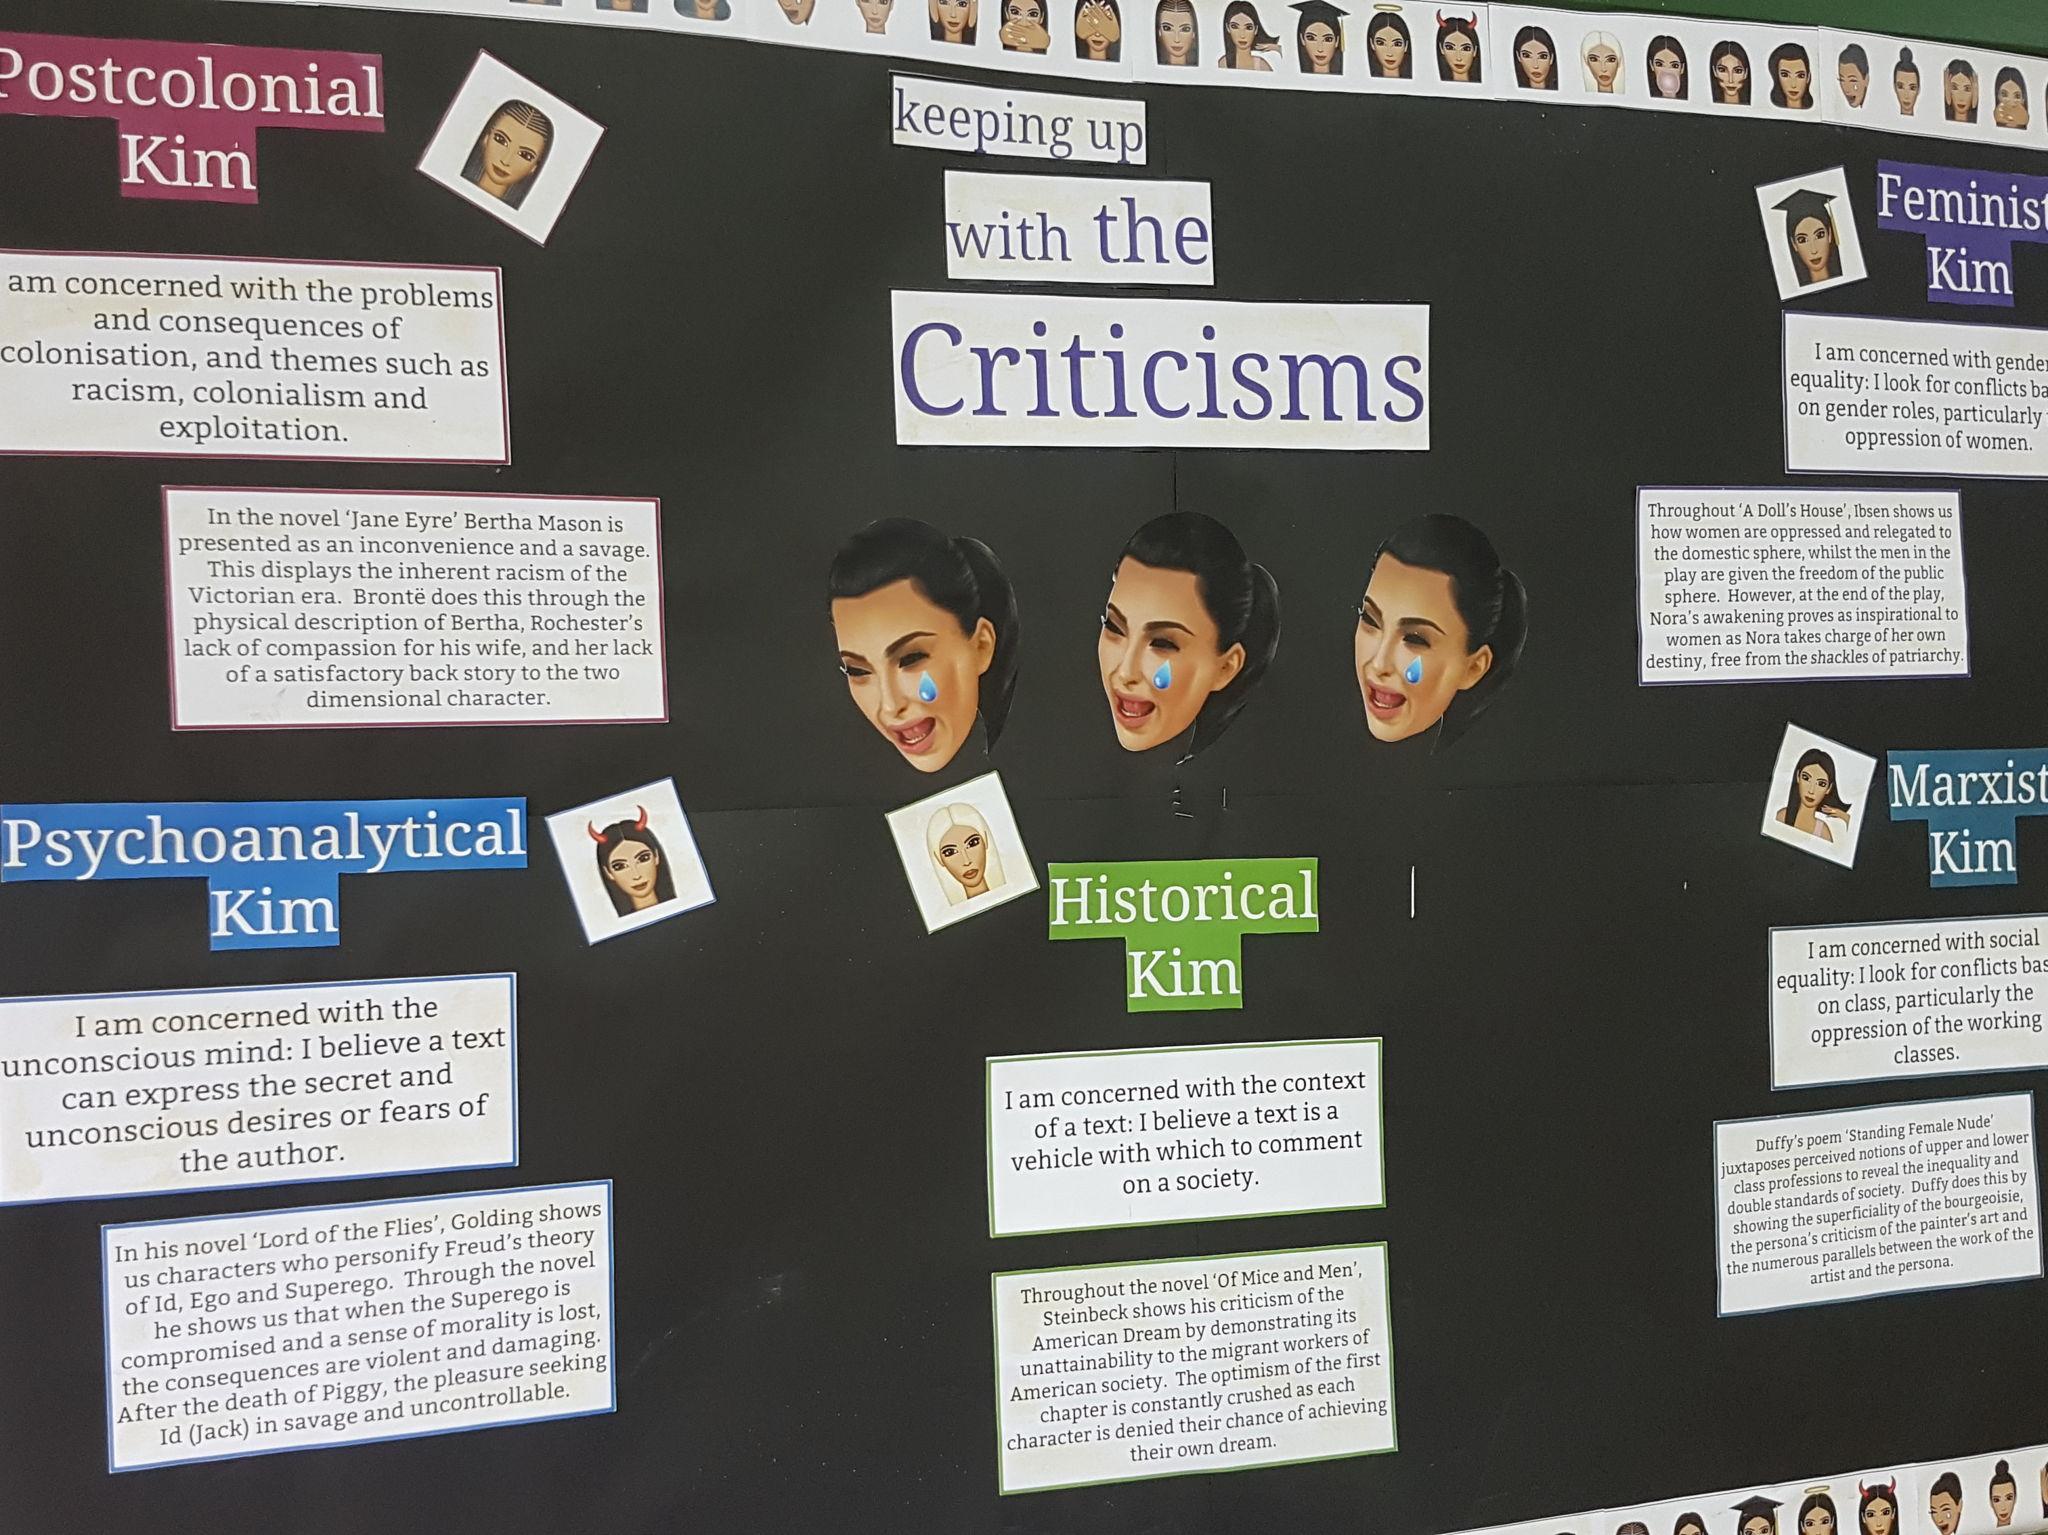 Literary Criticism display with Kim Kardashian